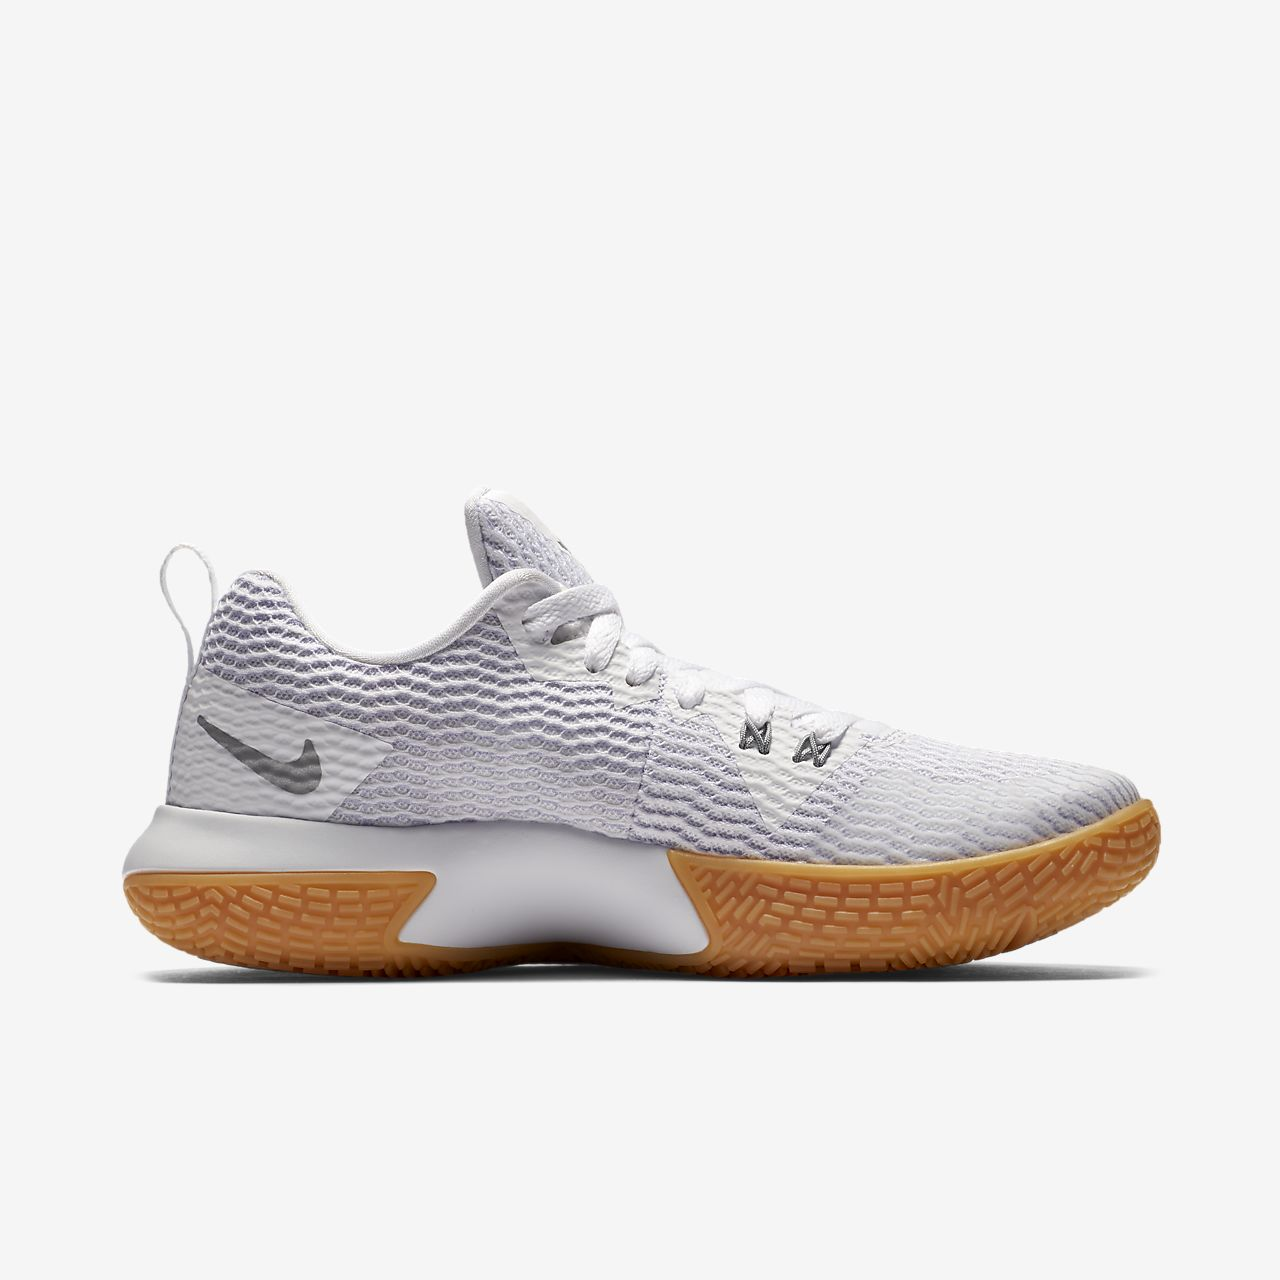 538b404d69a Nike Zoom Live II Women s Basketball Shoe. Nike.com CA